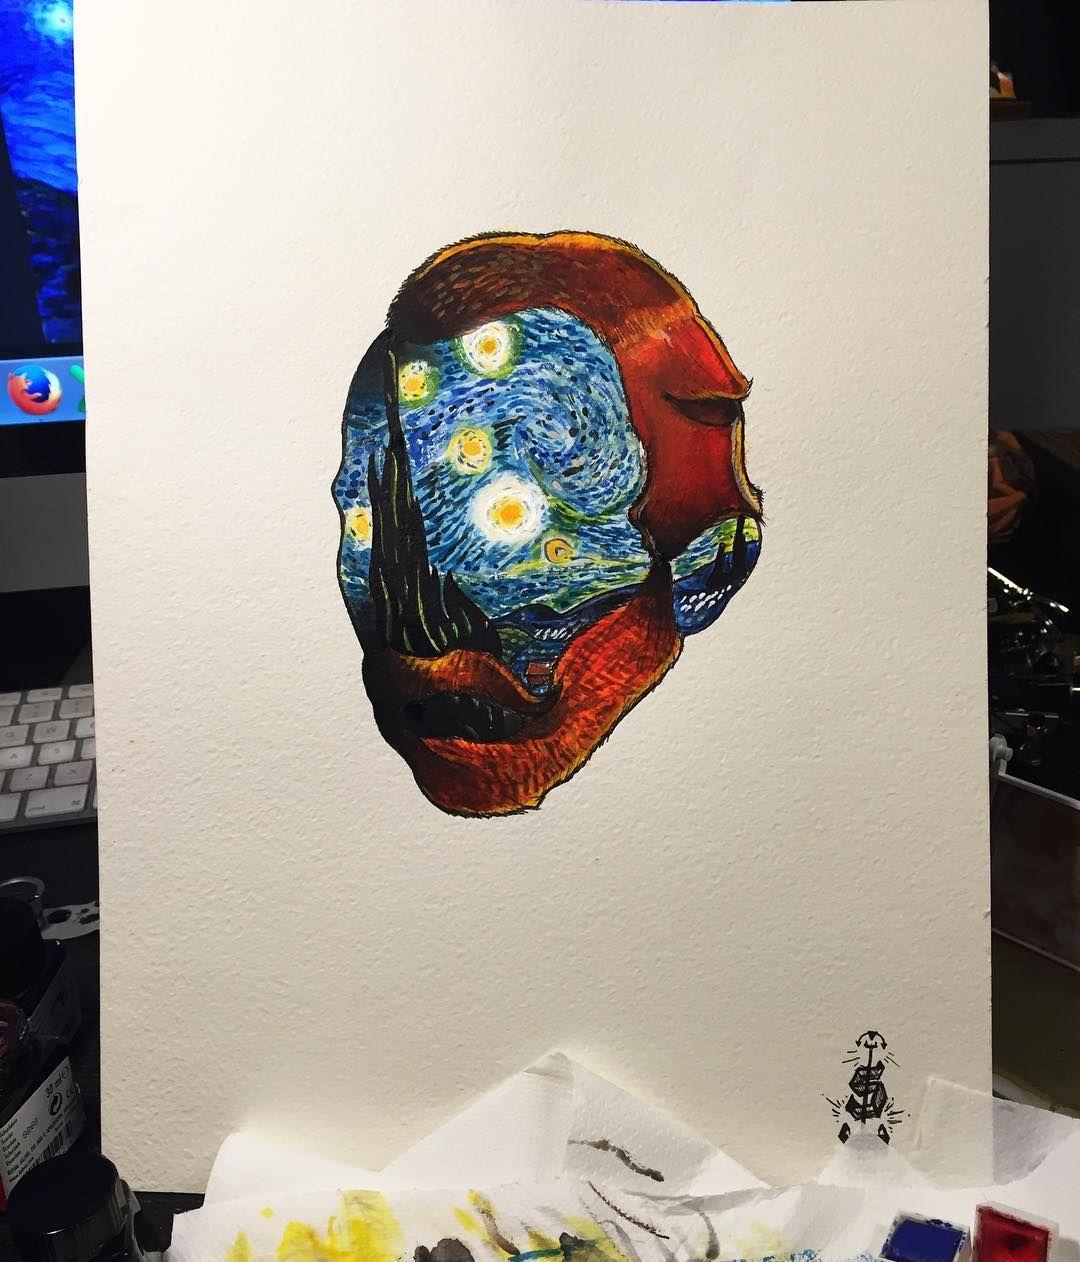 Vincent Van Gogh Tattoo Sketch Idea For Tattoo Starry Night